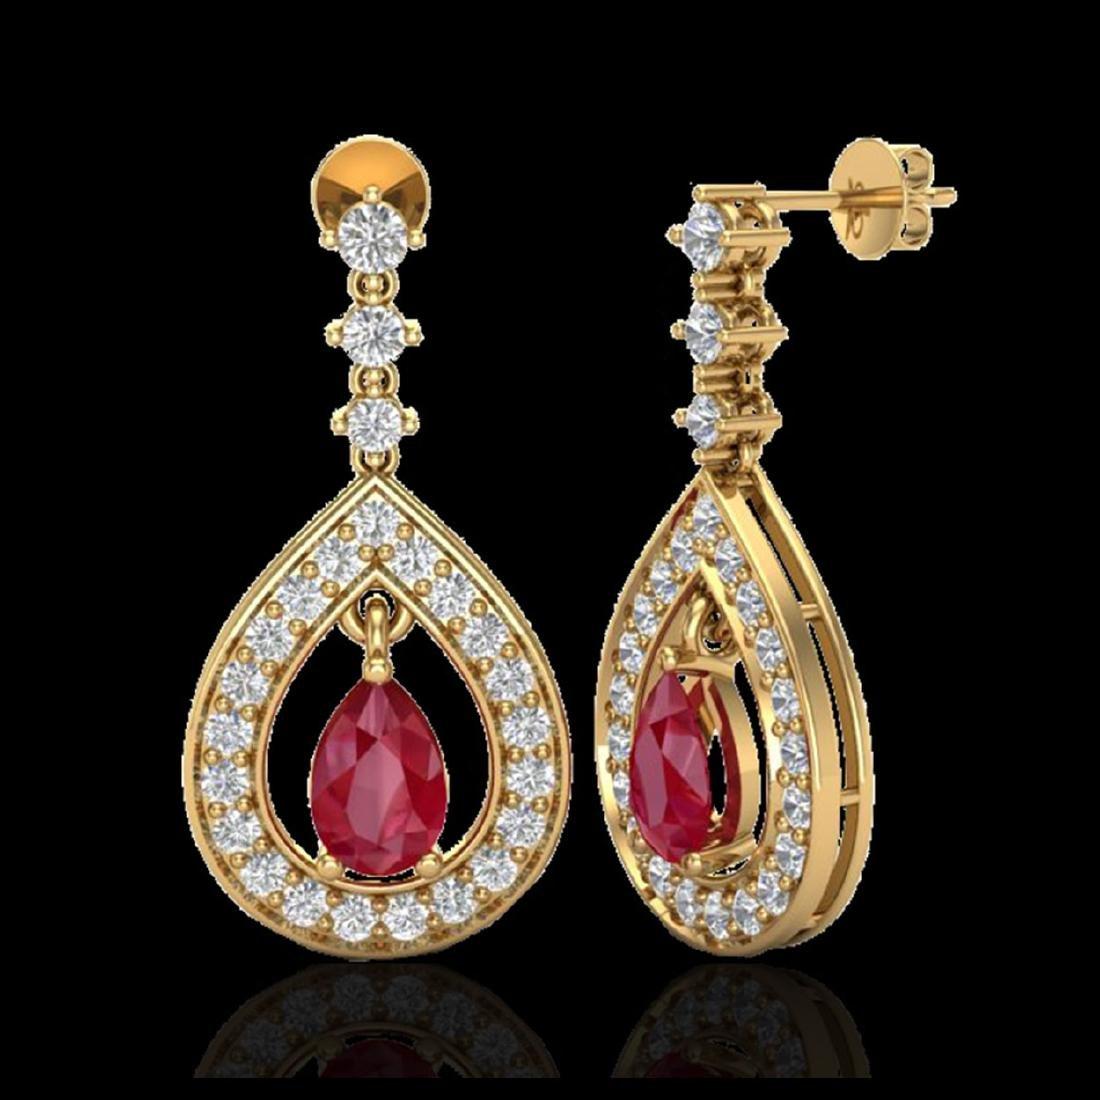 2.25 ctw Ruby & VS/SI Diamond Earrings 14K Yellow Gold - 2